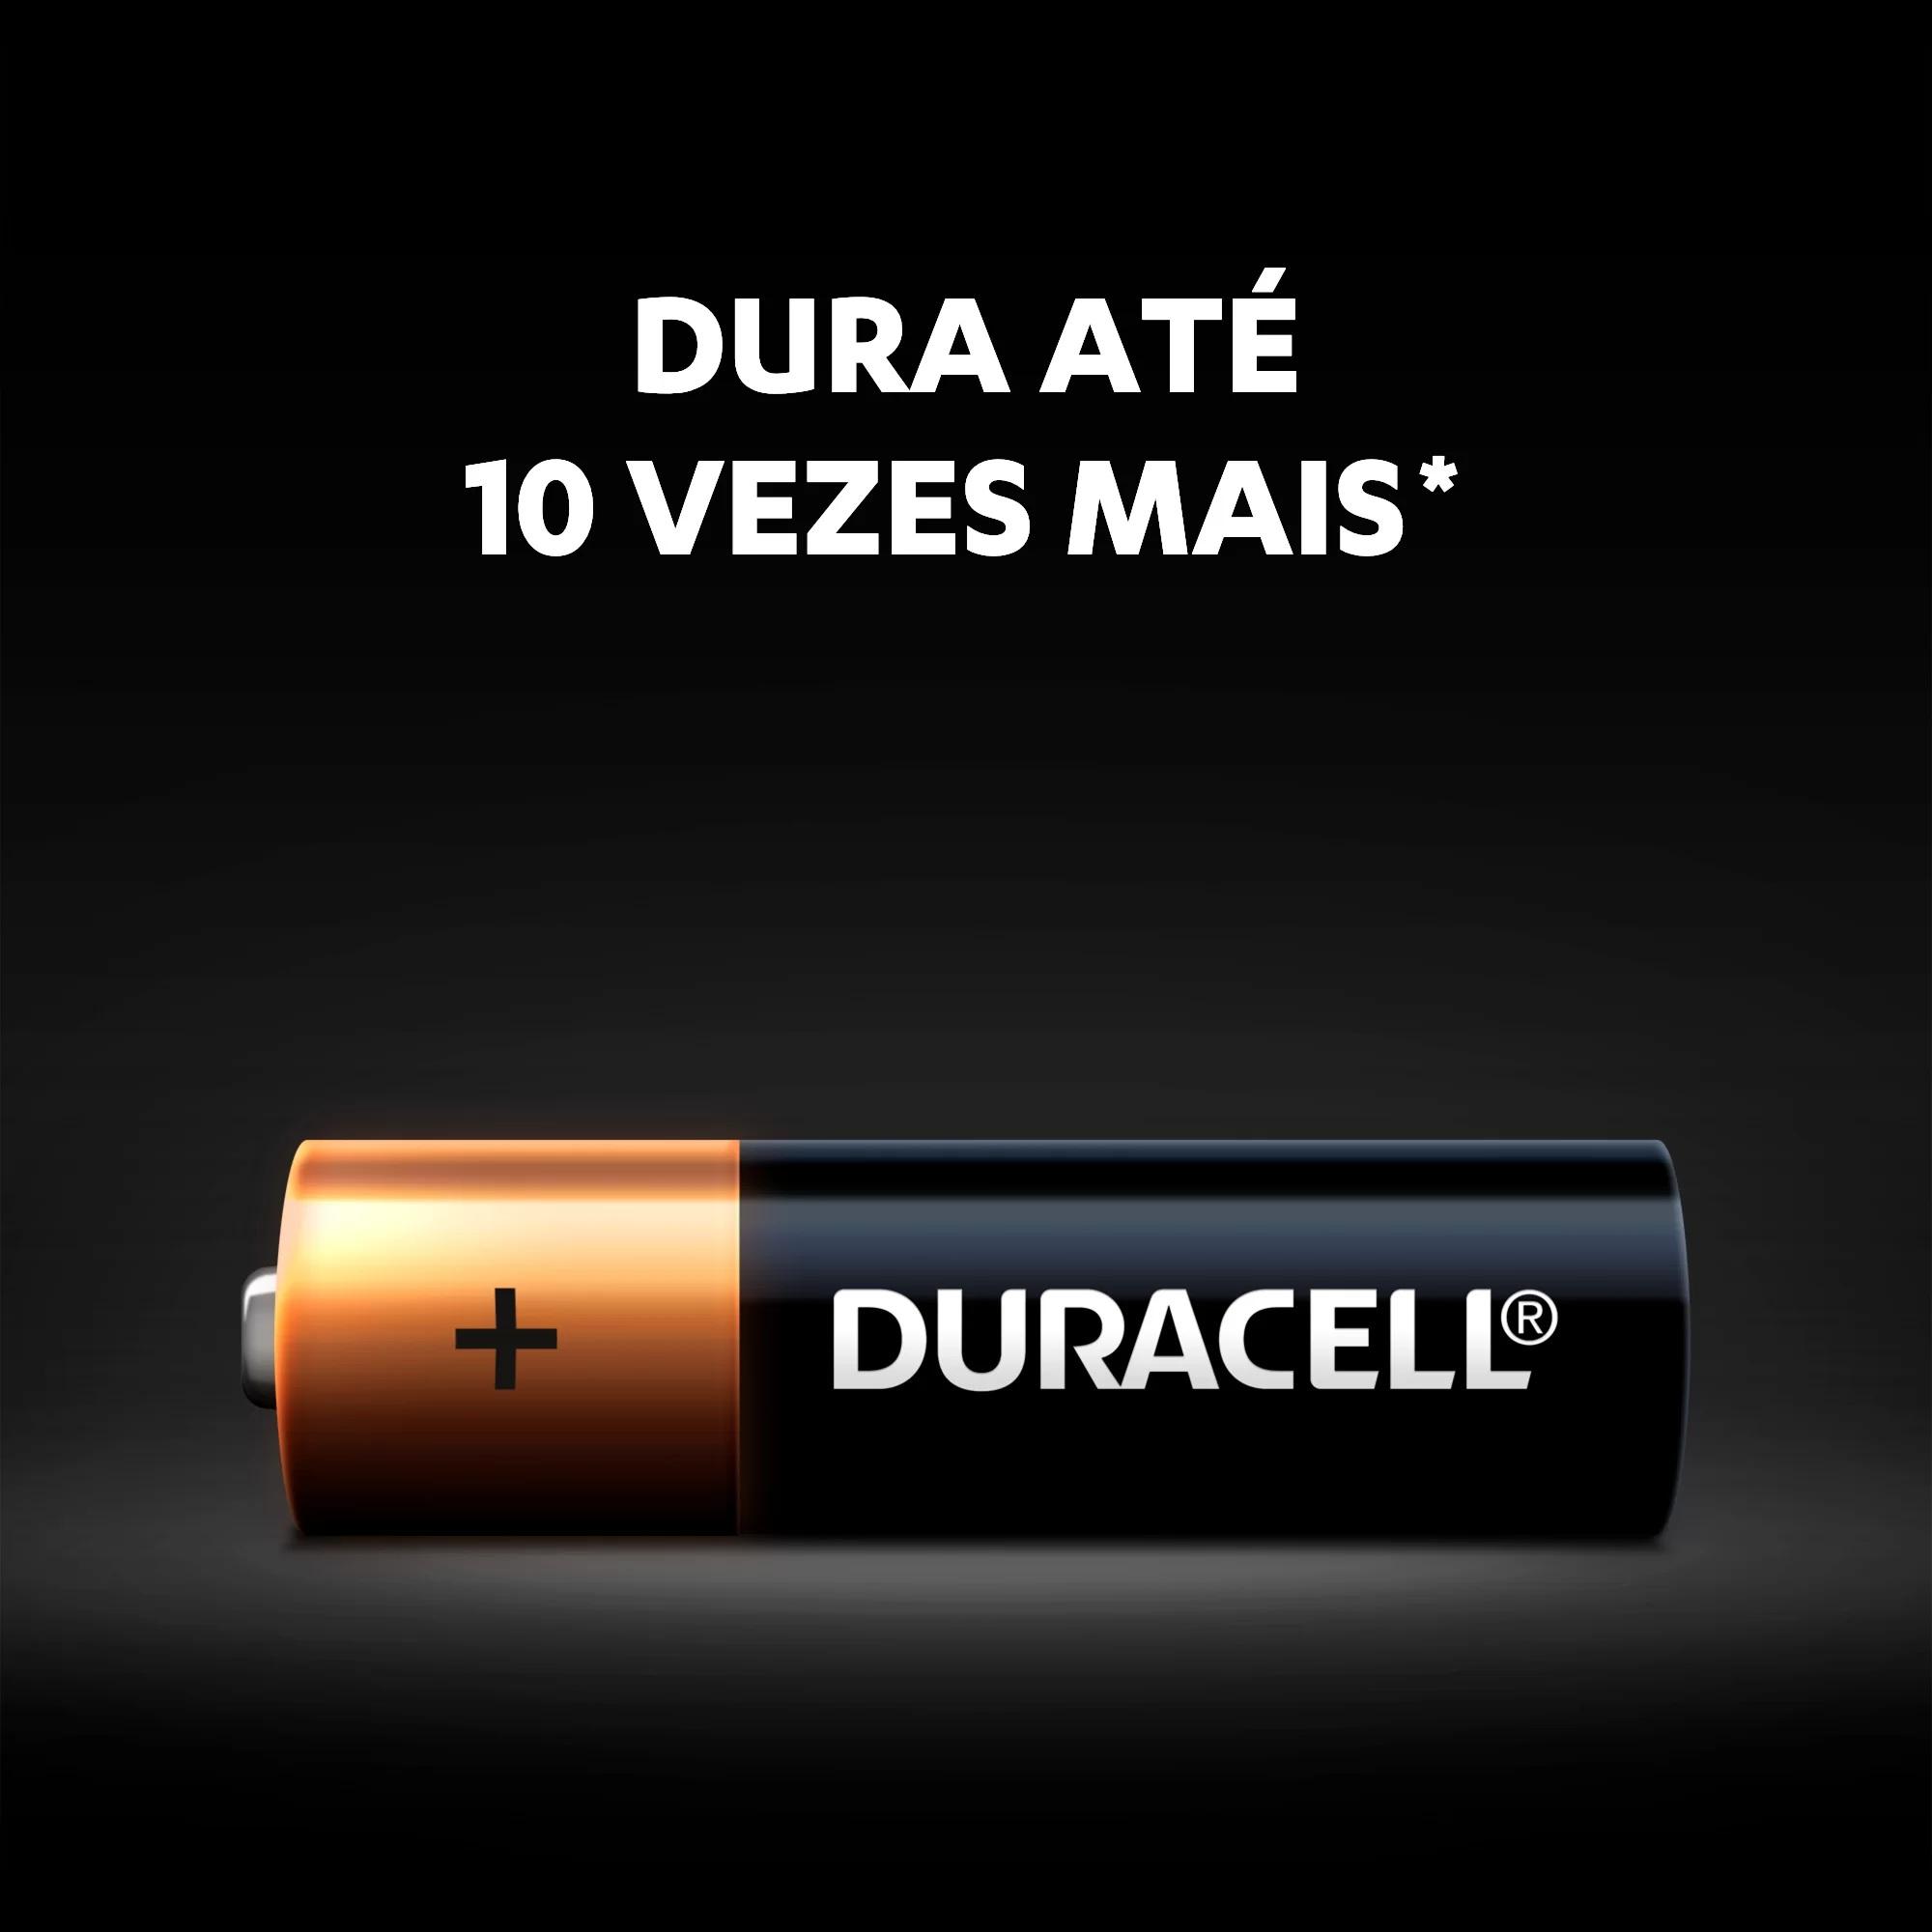 Pilha Aa Alcalina Duracell C/16 Unidades Mn1500b16 Promoção